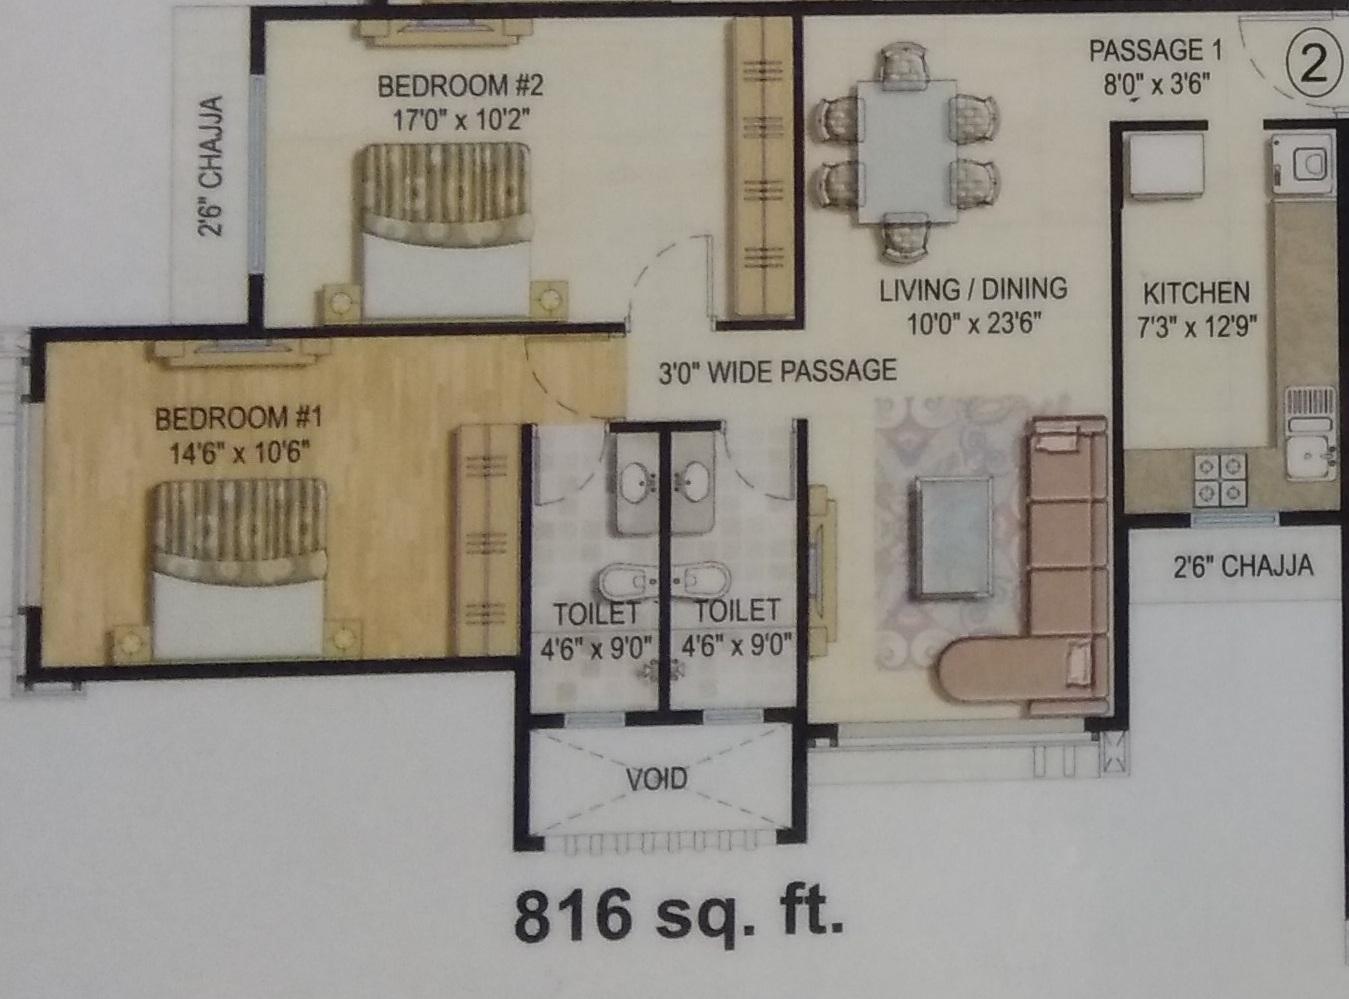 vijay khetan krishna residences apartment 2 bhk 816sqft 20203903163940